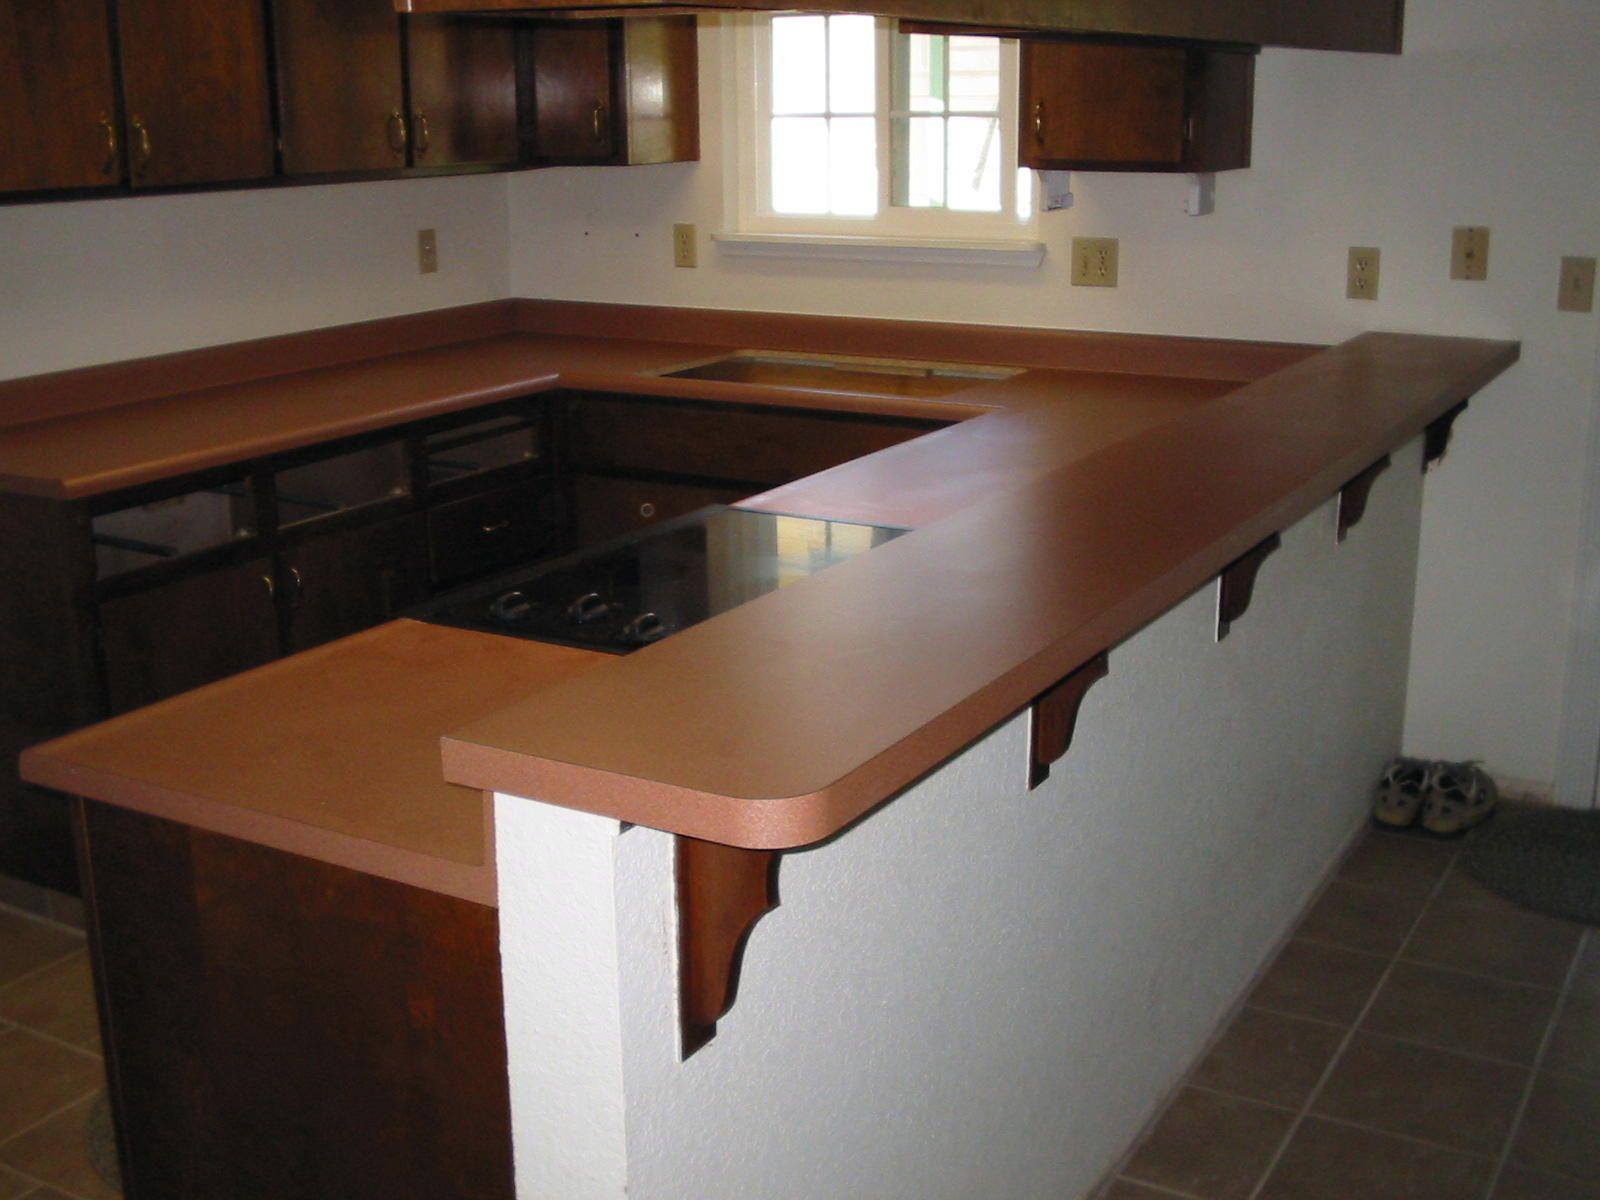 Kitchen Counter Bar Cleaning Wilsonart Laminate Countertops